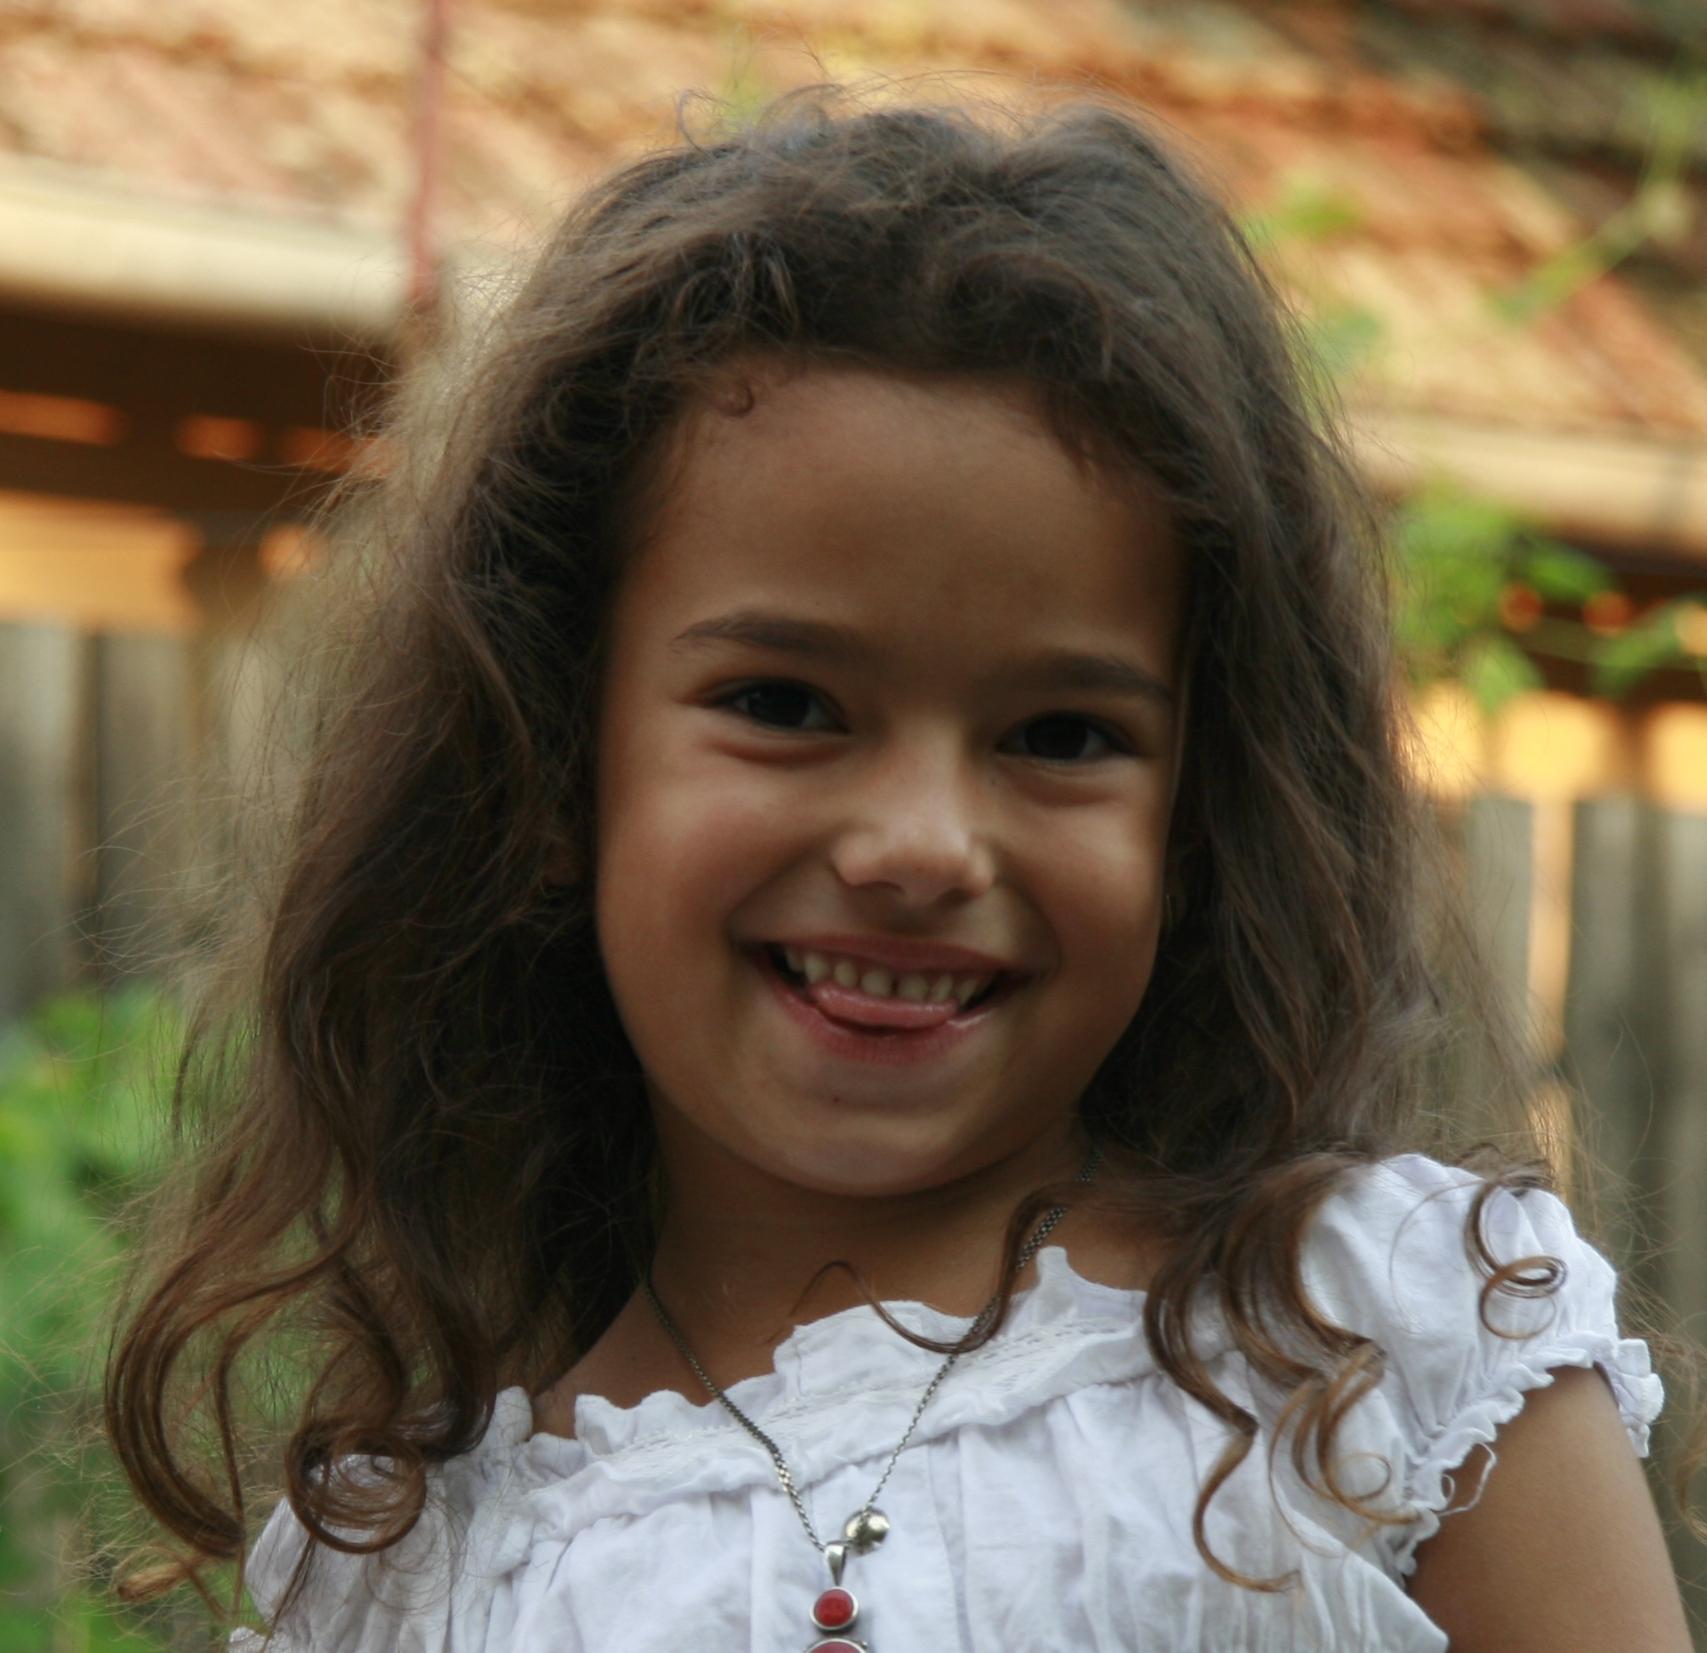 Turns! Cute little girl